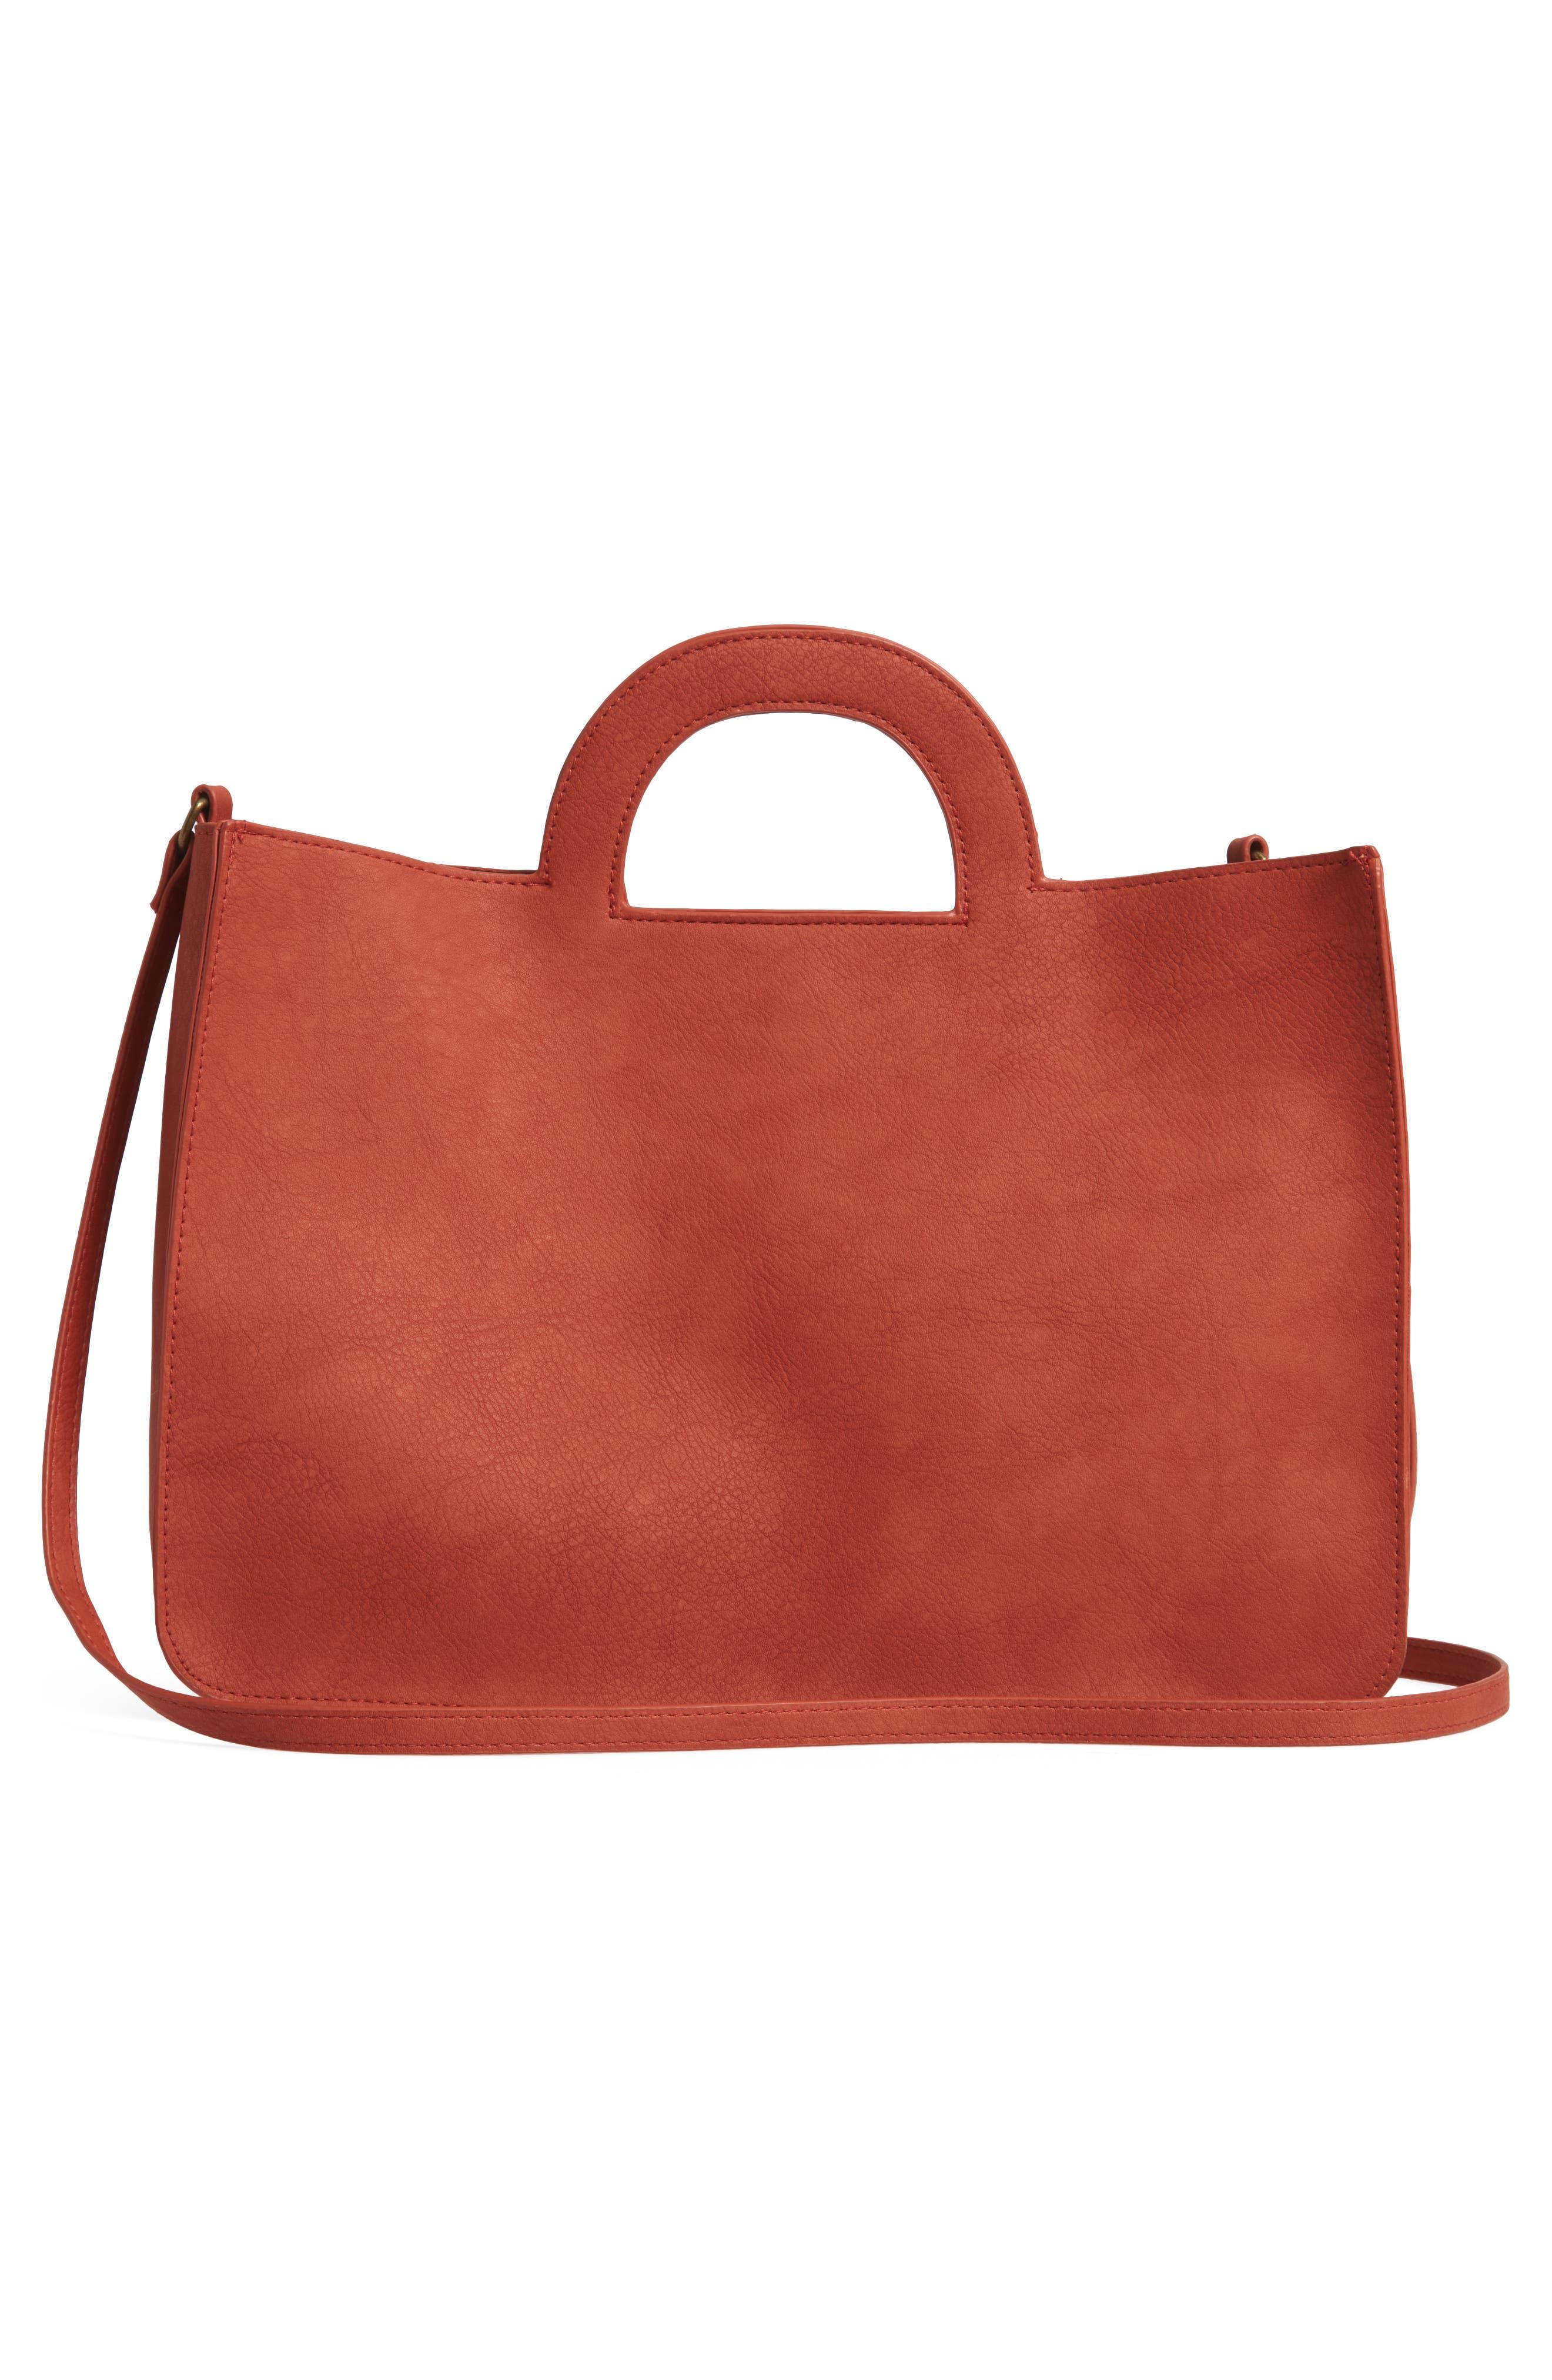 T-SHIRT & JEANS, Faux Leather Top Handle Tote Bag, Alternate thumbnail 4, color, 805